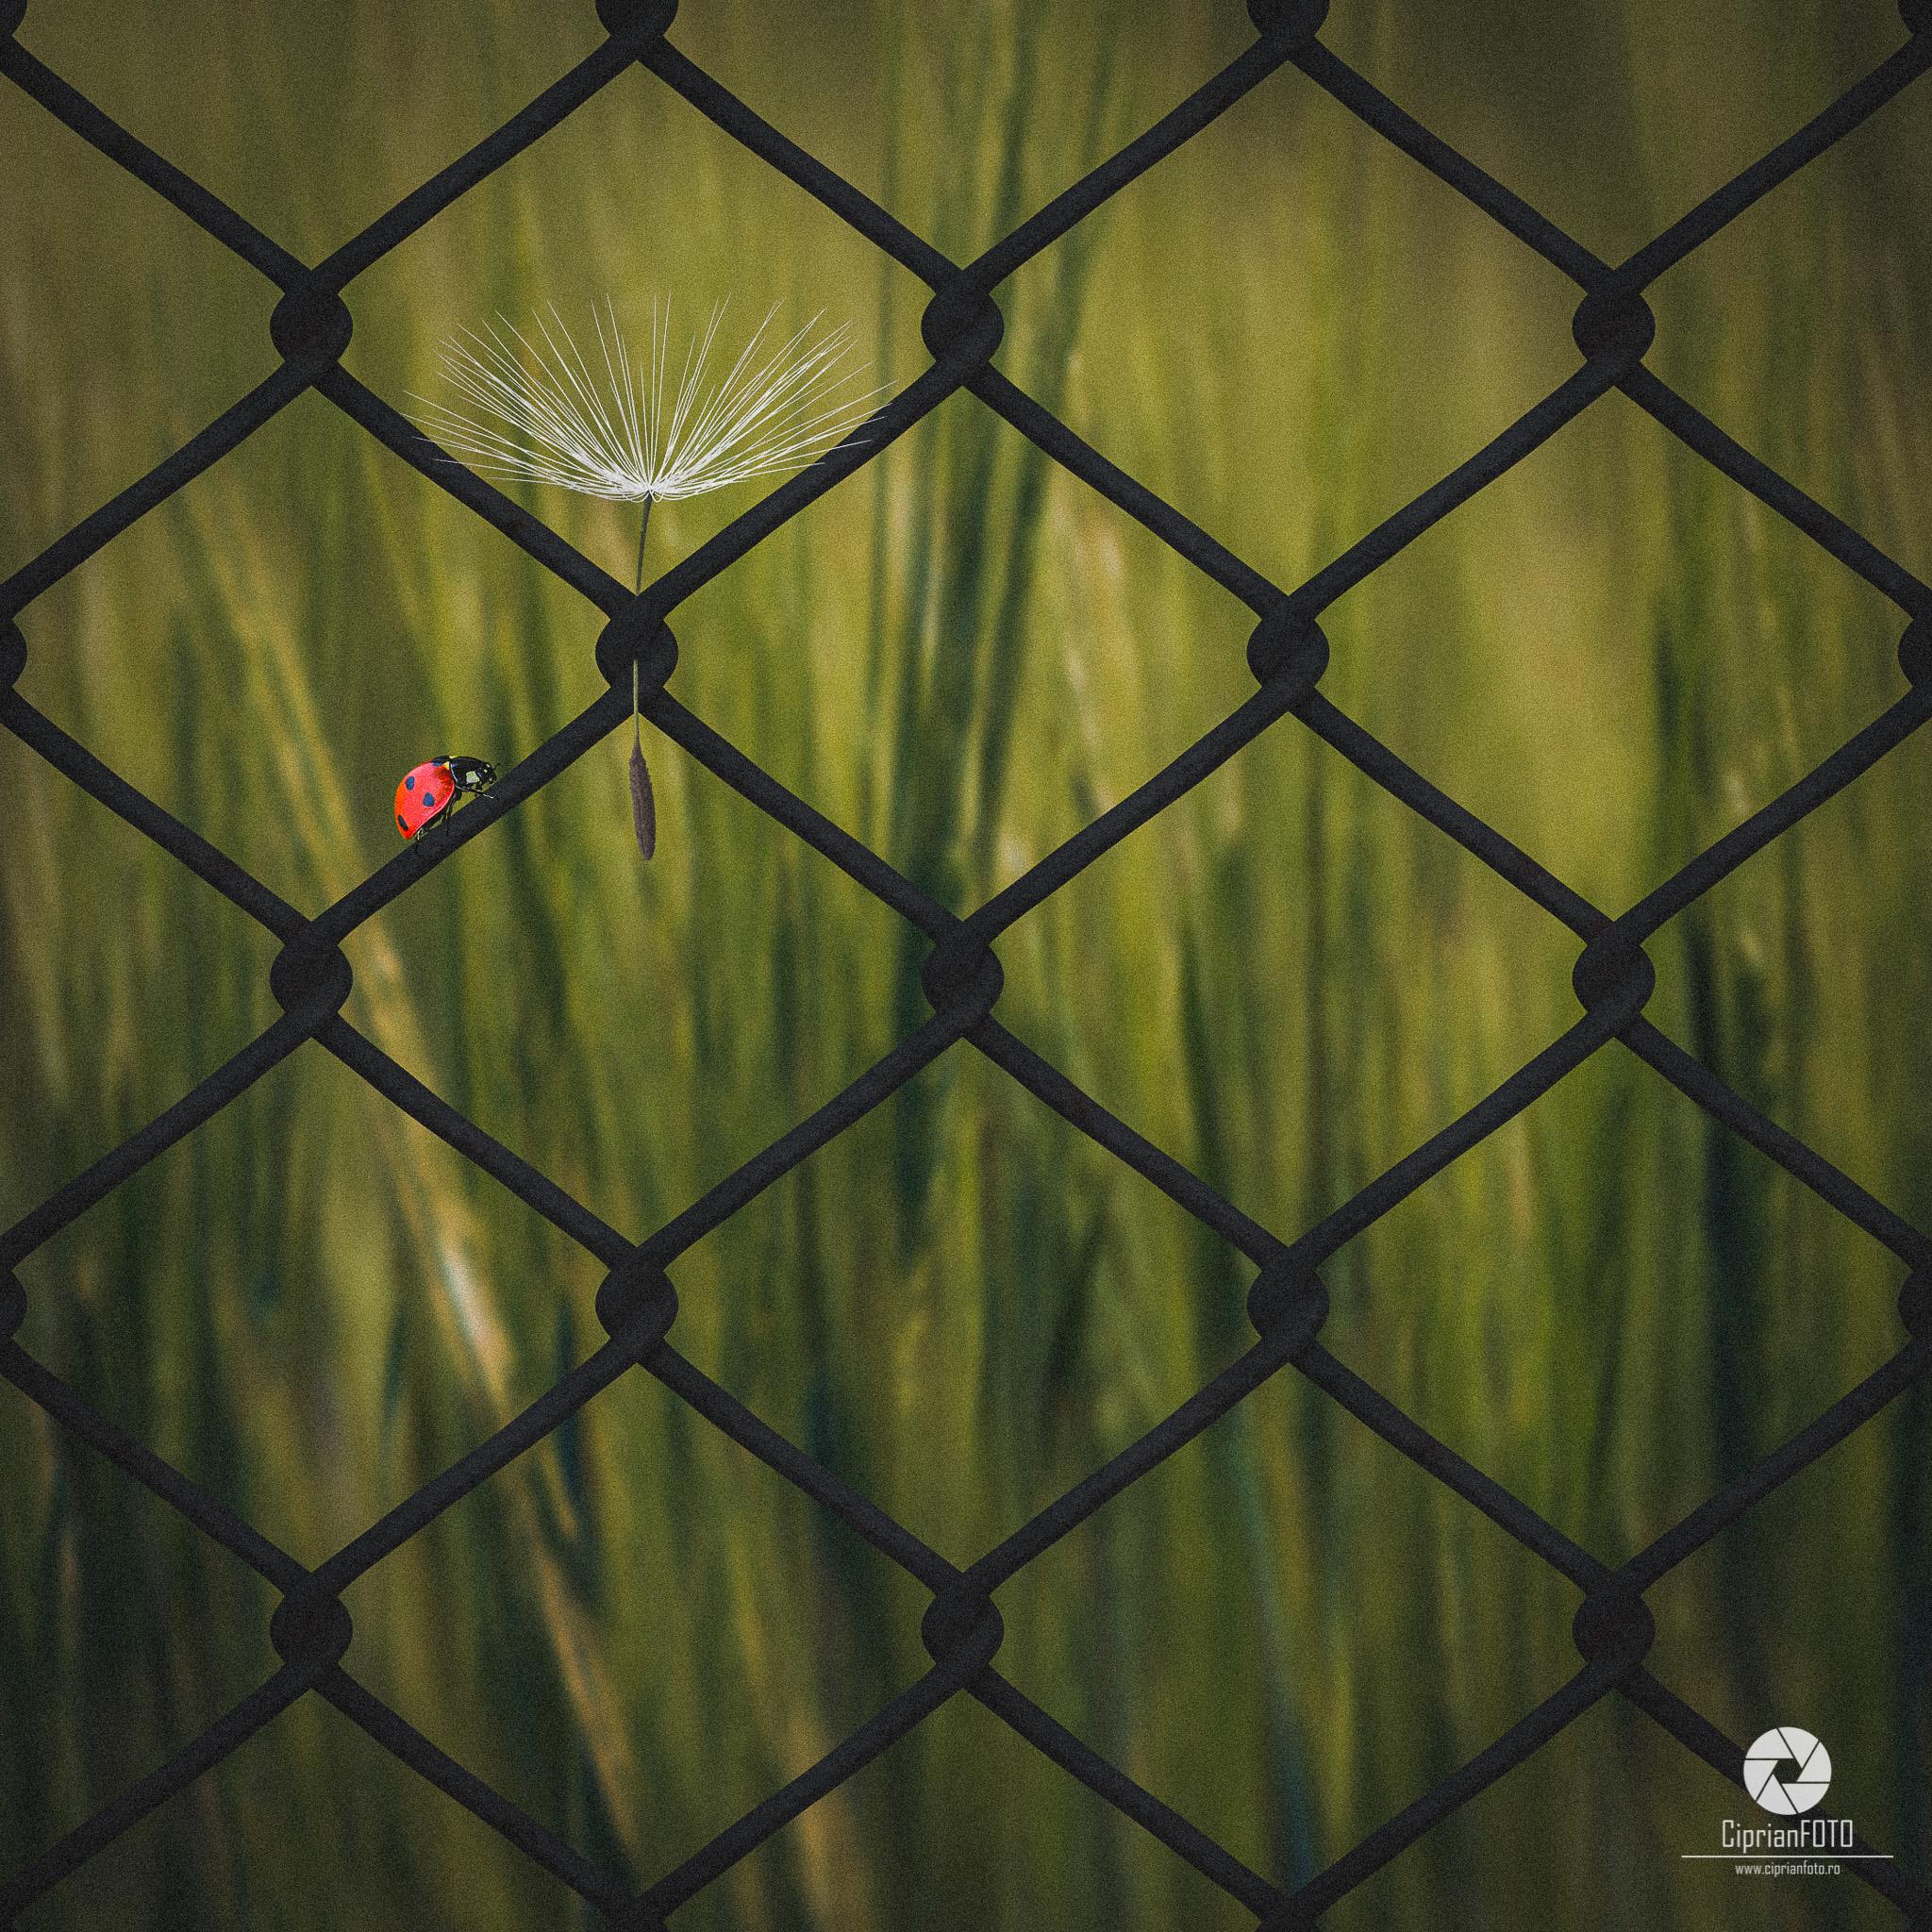 Photoshop Manipulation Tutorial, Ladybug On The Metal Fence, CiprianFOTO